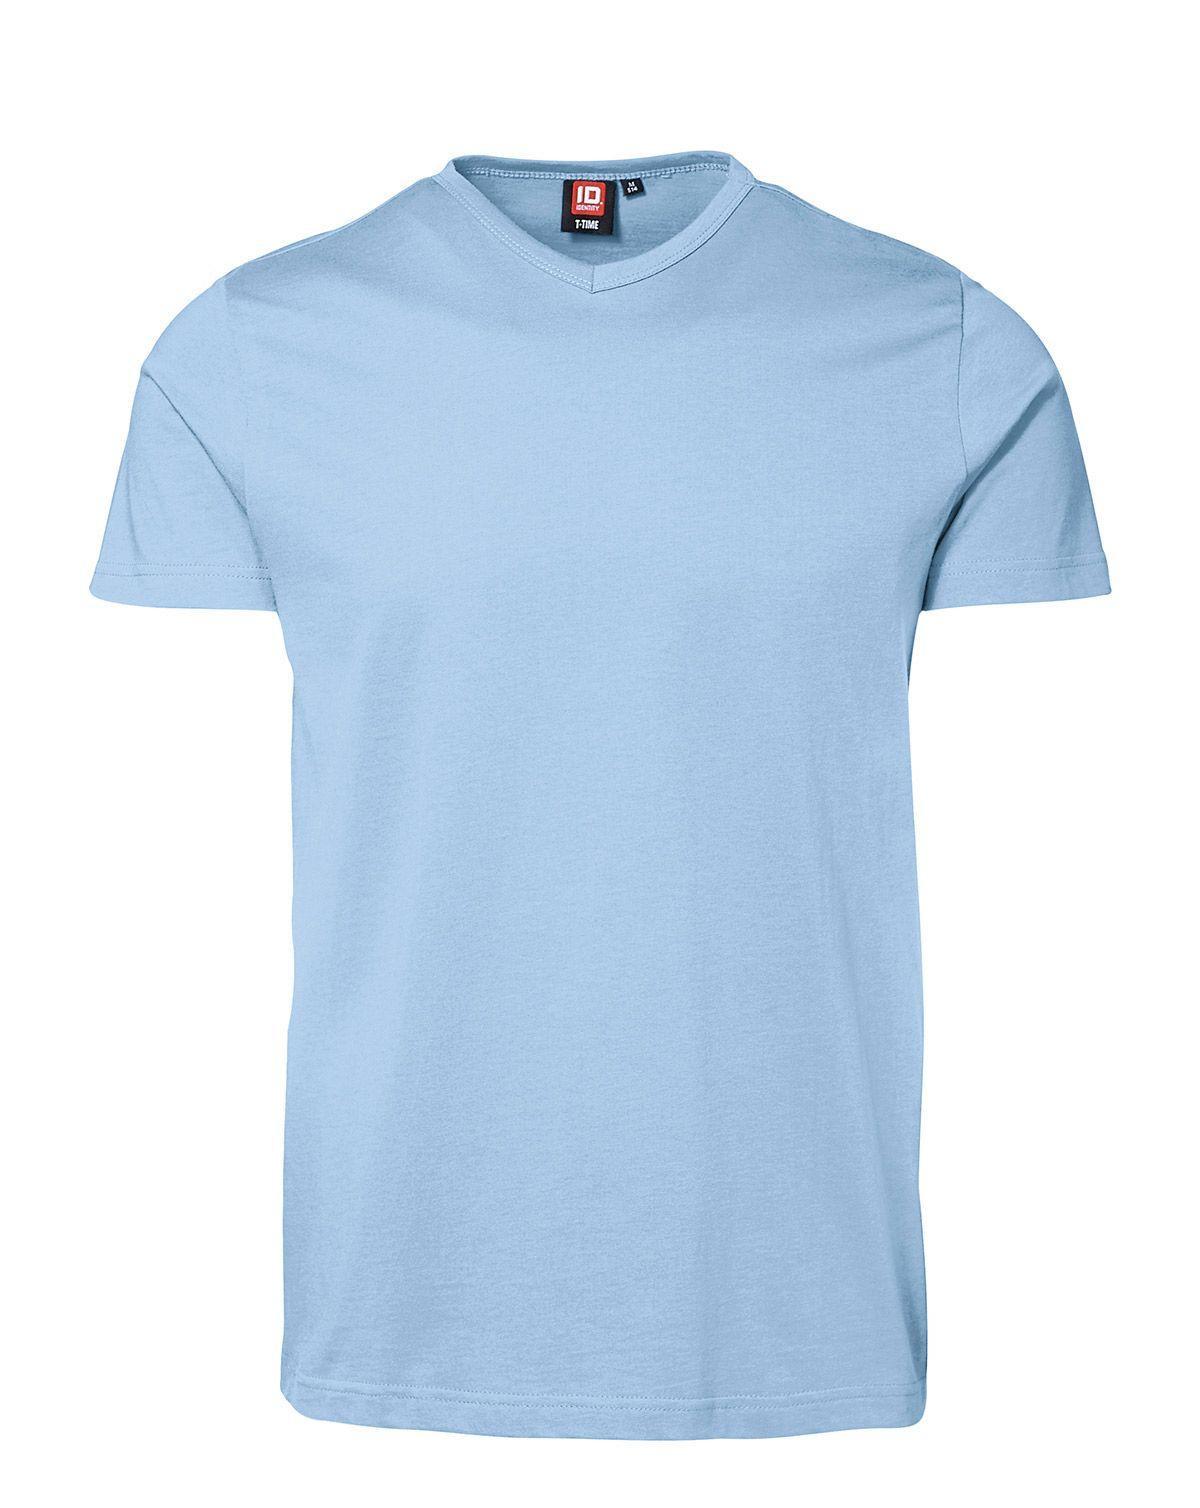 ID V-hals T-shirt (Lyseblå, 2XL)